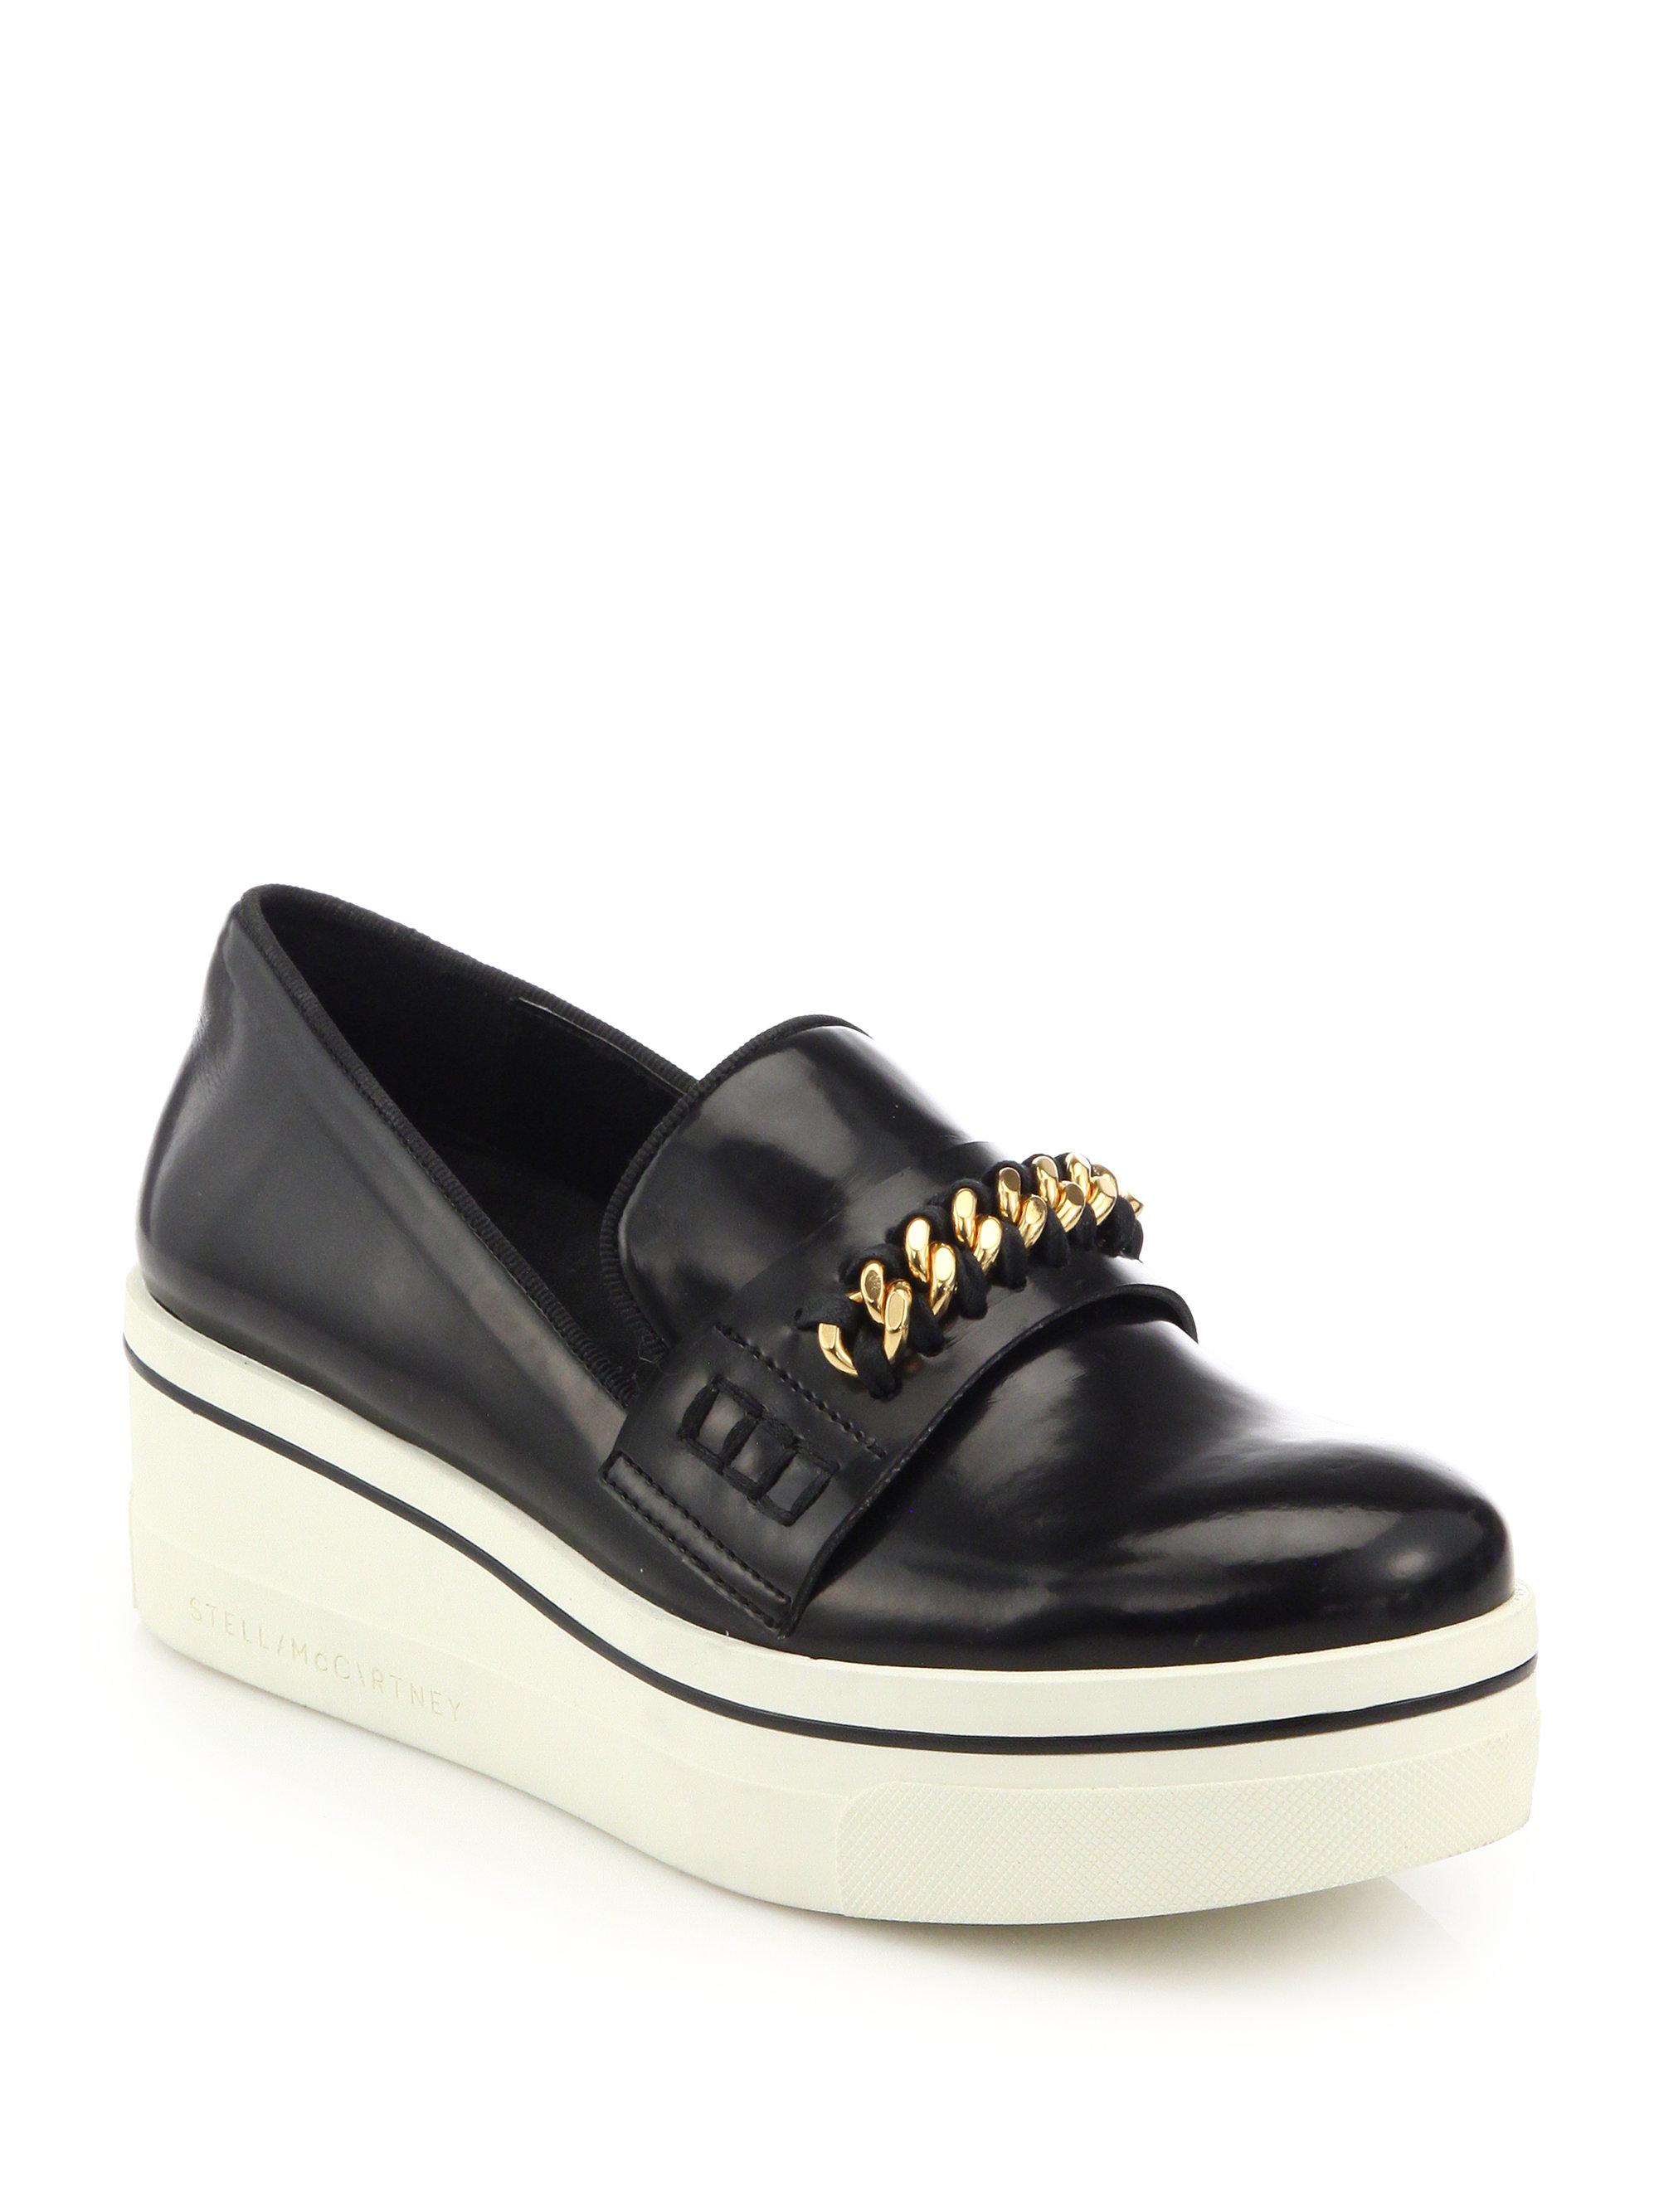 0bc1de7924b7 Lyst - Stella McCartney Chain-trimmed Rubber-platform Loafers in Black